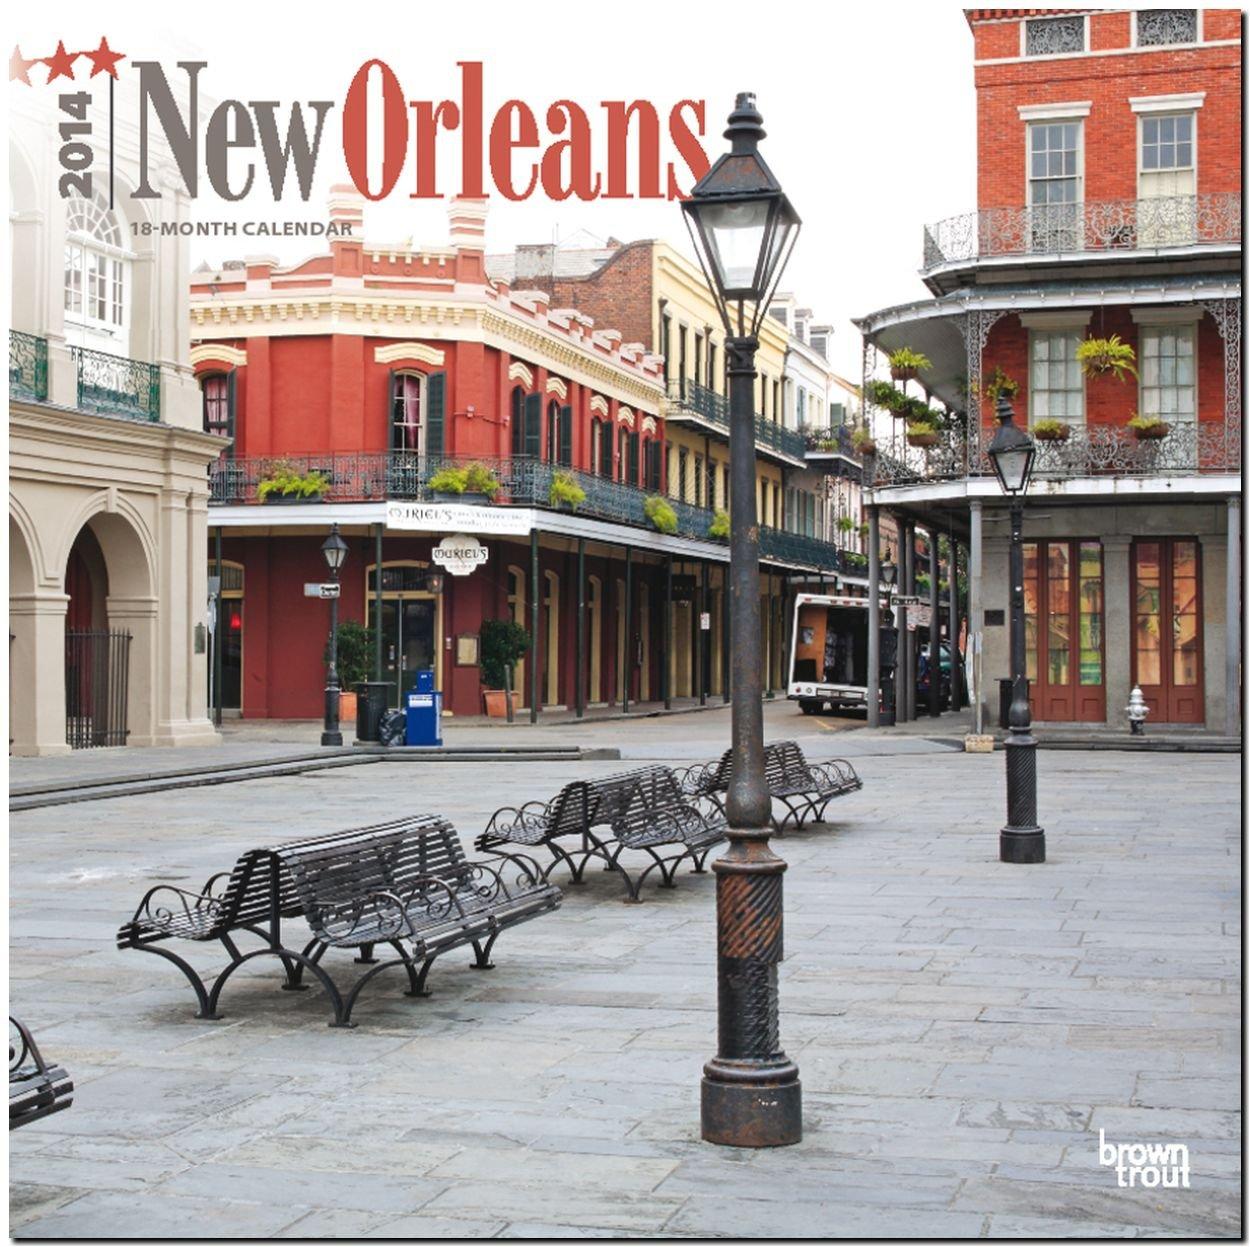 New Orleans 2014: Original BrownTrout-Kalender [Mehrsprachig] [Kalender] Kalender – Wandkalender, 30. September 2013 Inc Browntrout Publishers Brown Trout 1465011757 Calendar